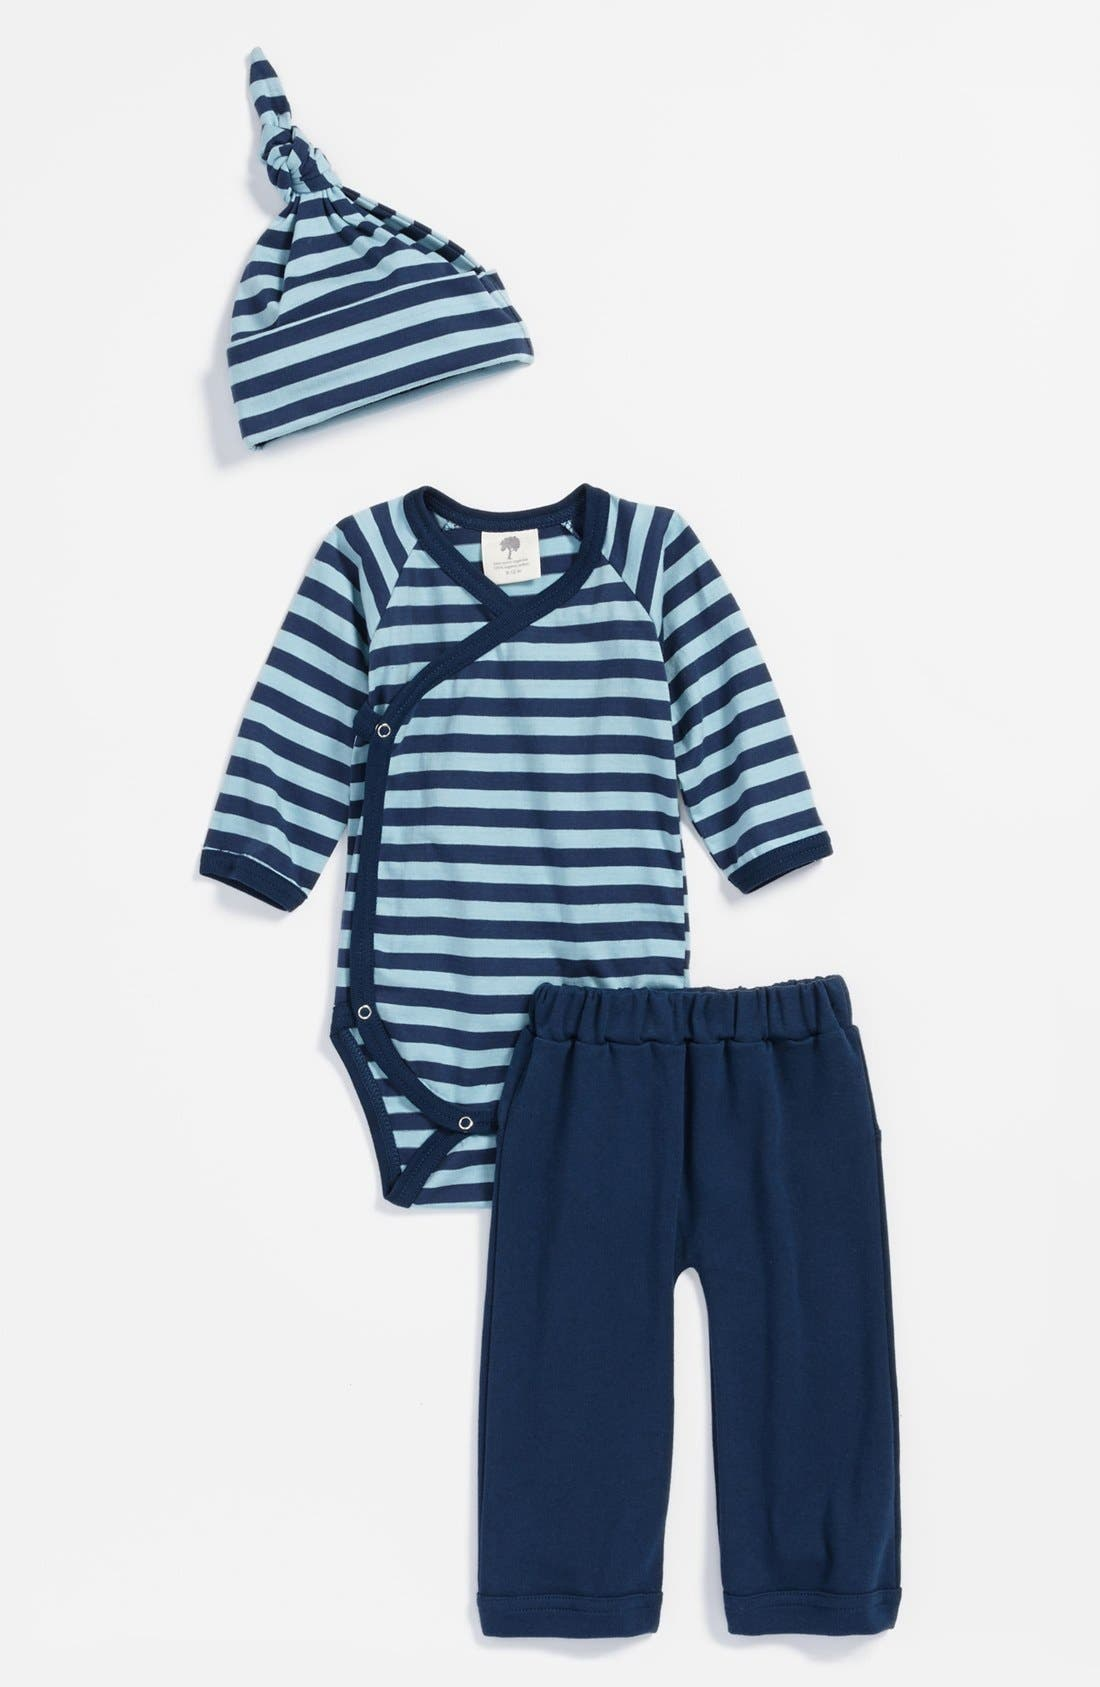 Alternate Image 1 Selected - Kate Quinn Organics 'Play' Bodysuit, Pants & Hat Set (Baby Boys)